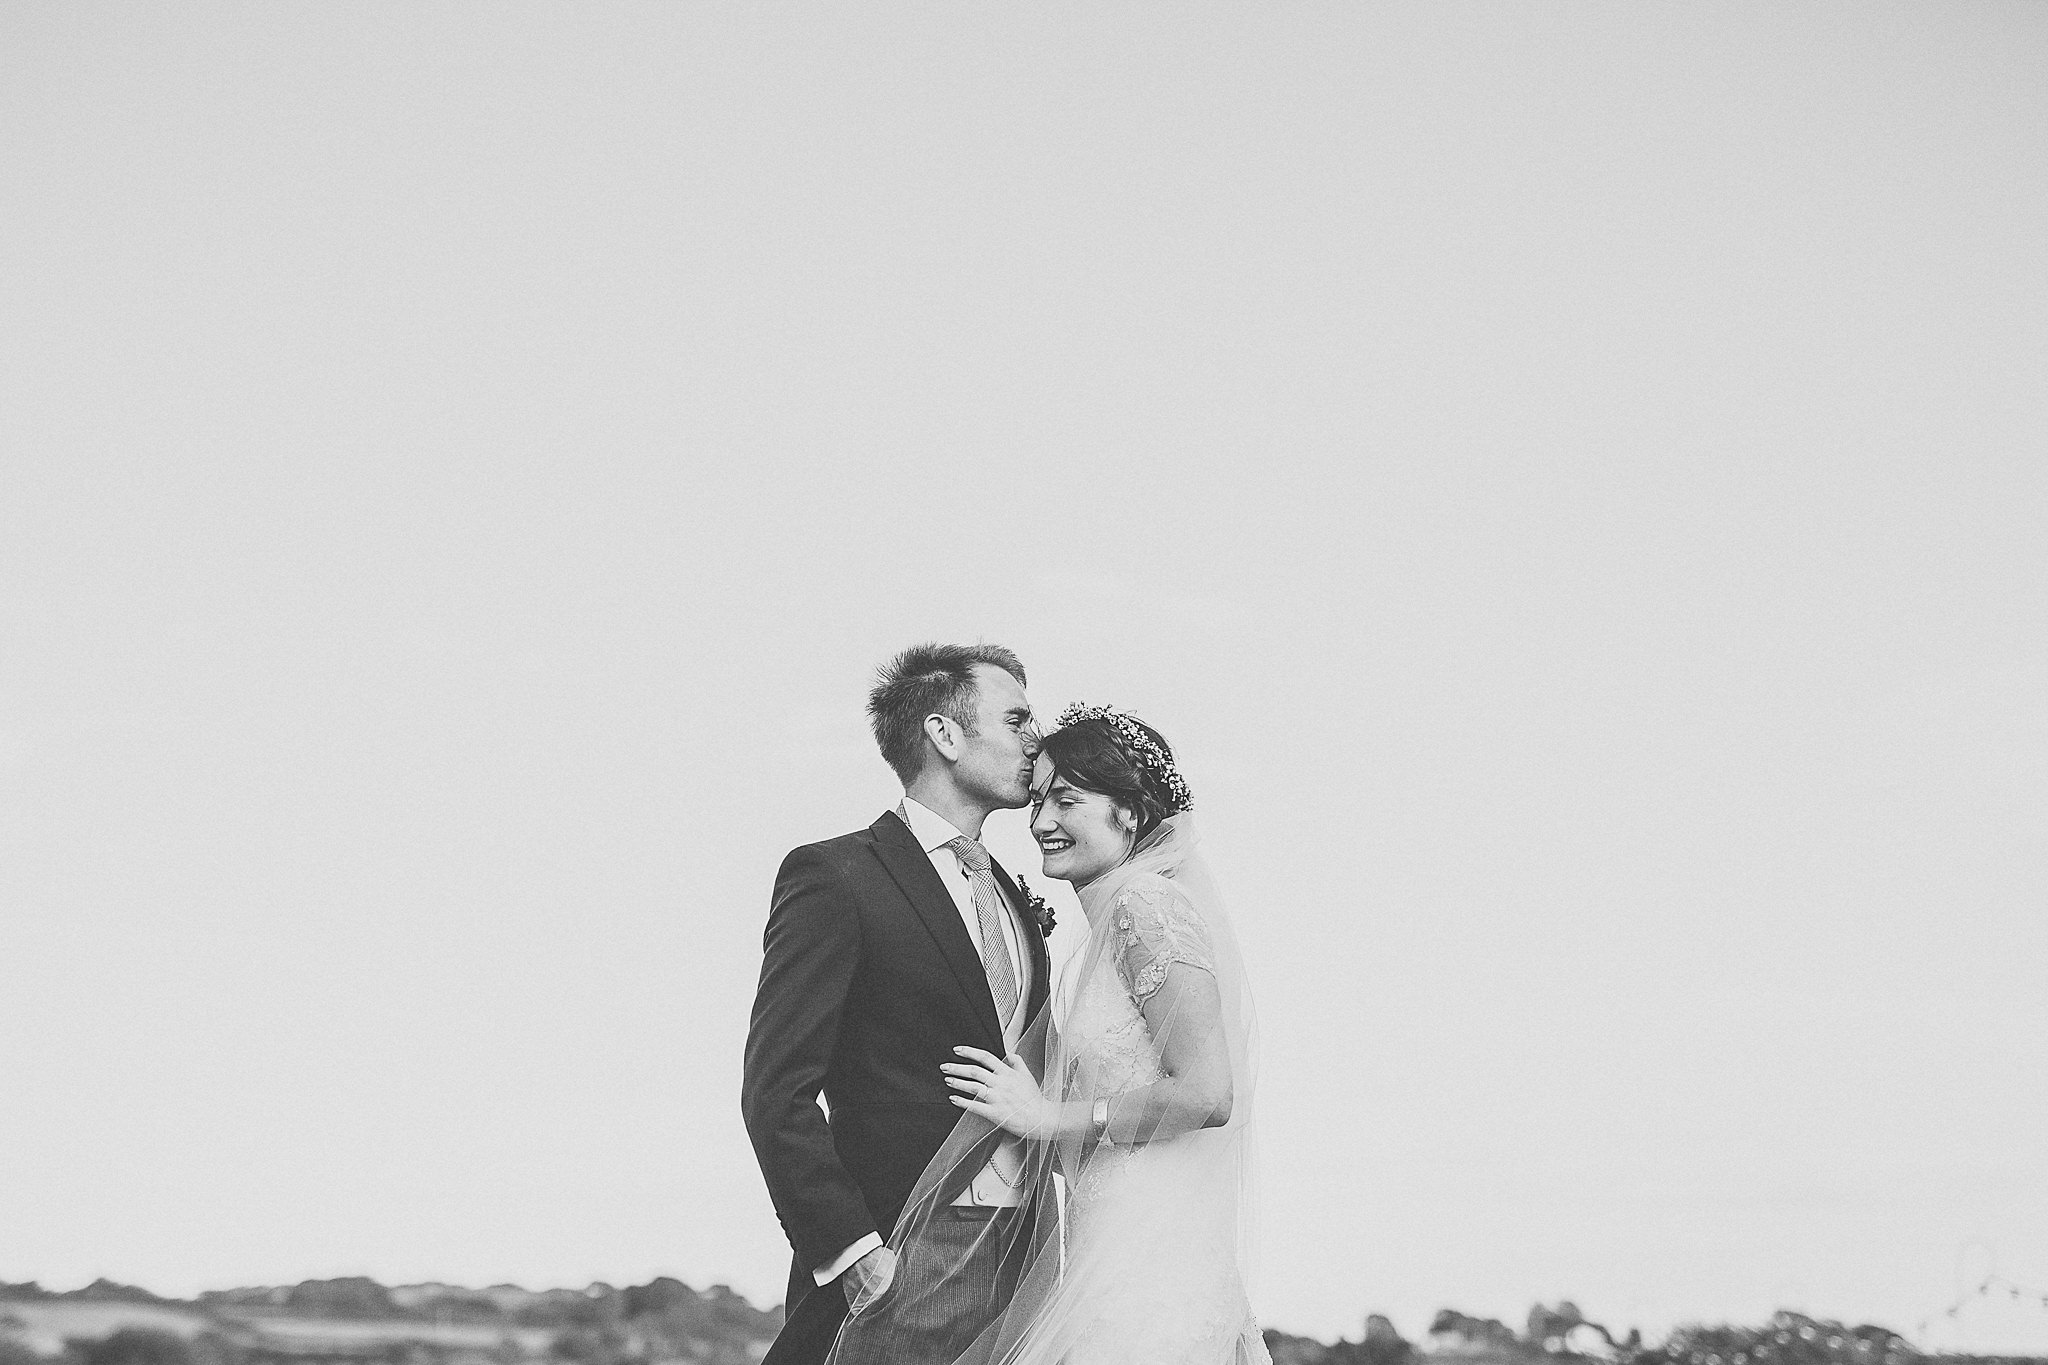 paul-marbrook-Farm-Wedding-Photographer-Lancashire-90066